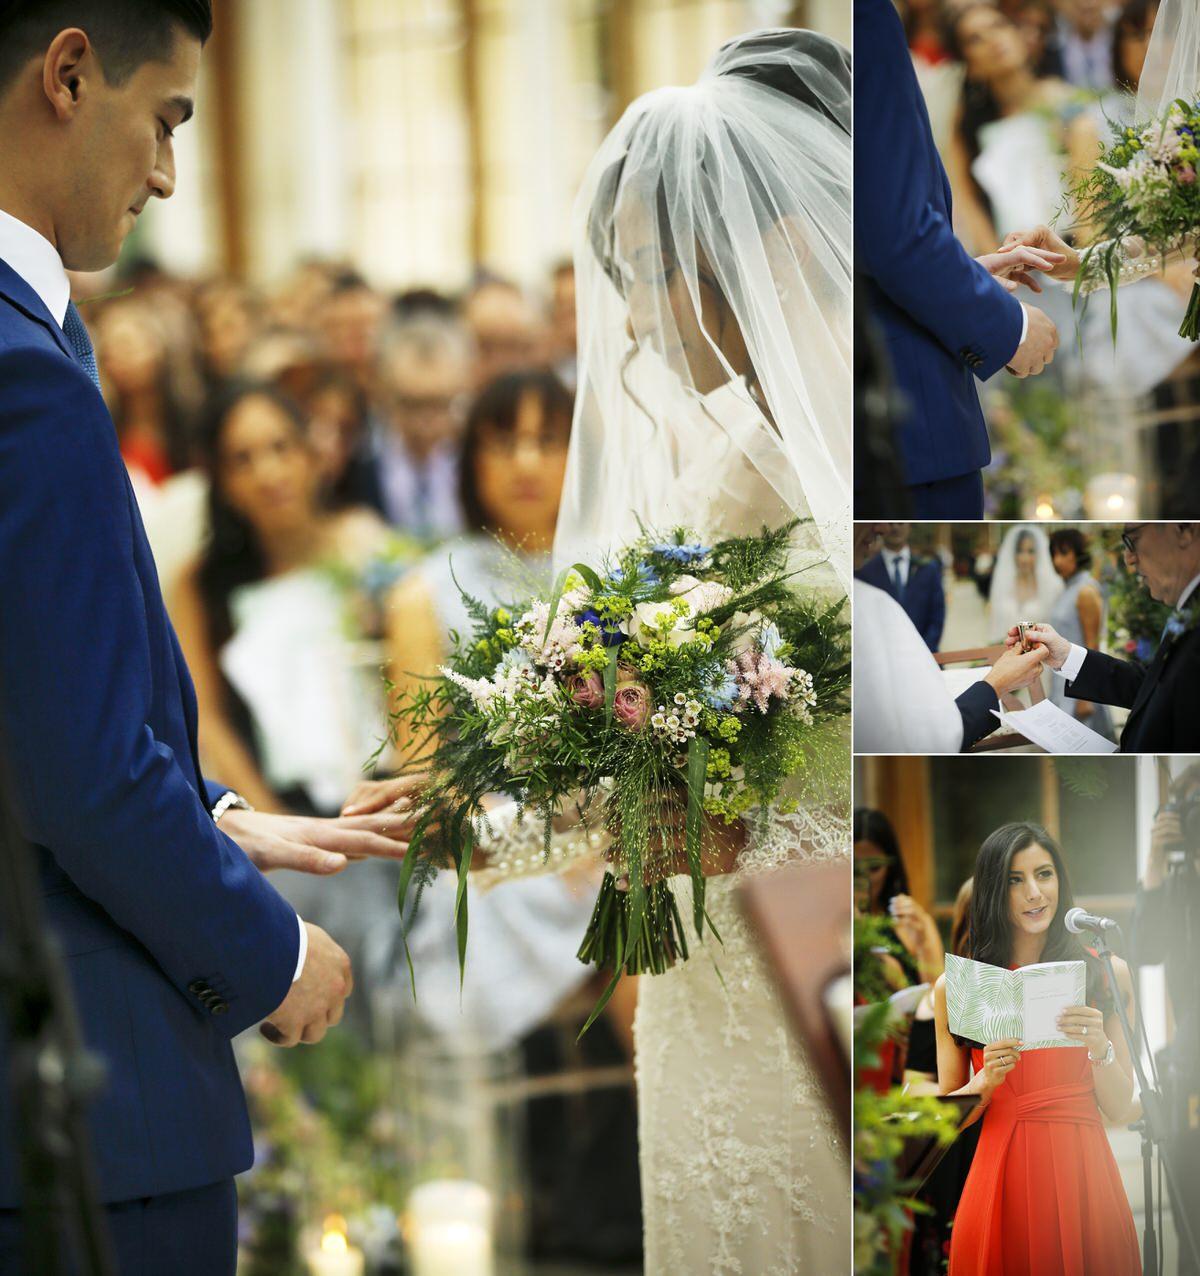 Brettharkness-kew-gardens-wedding_0016.jpg